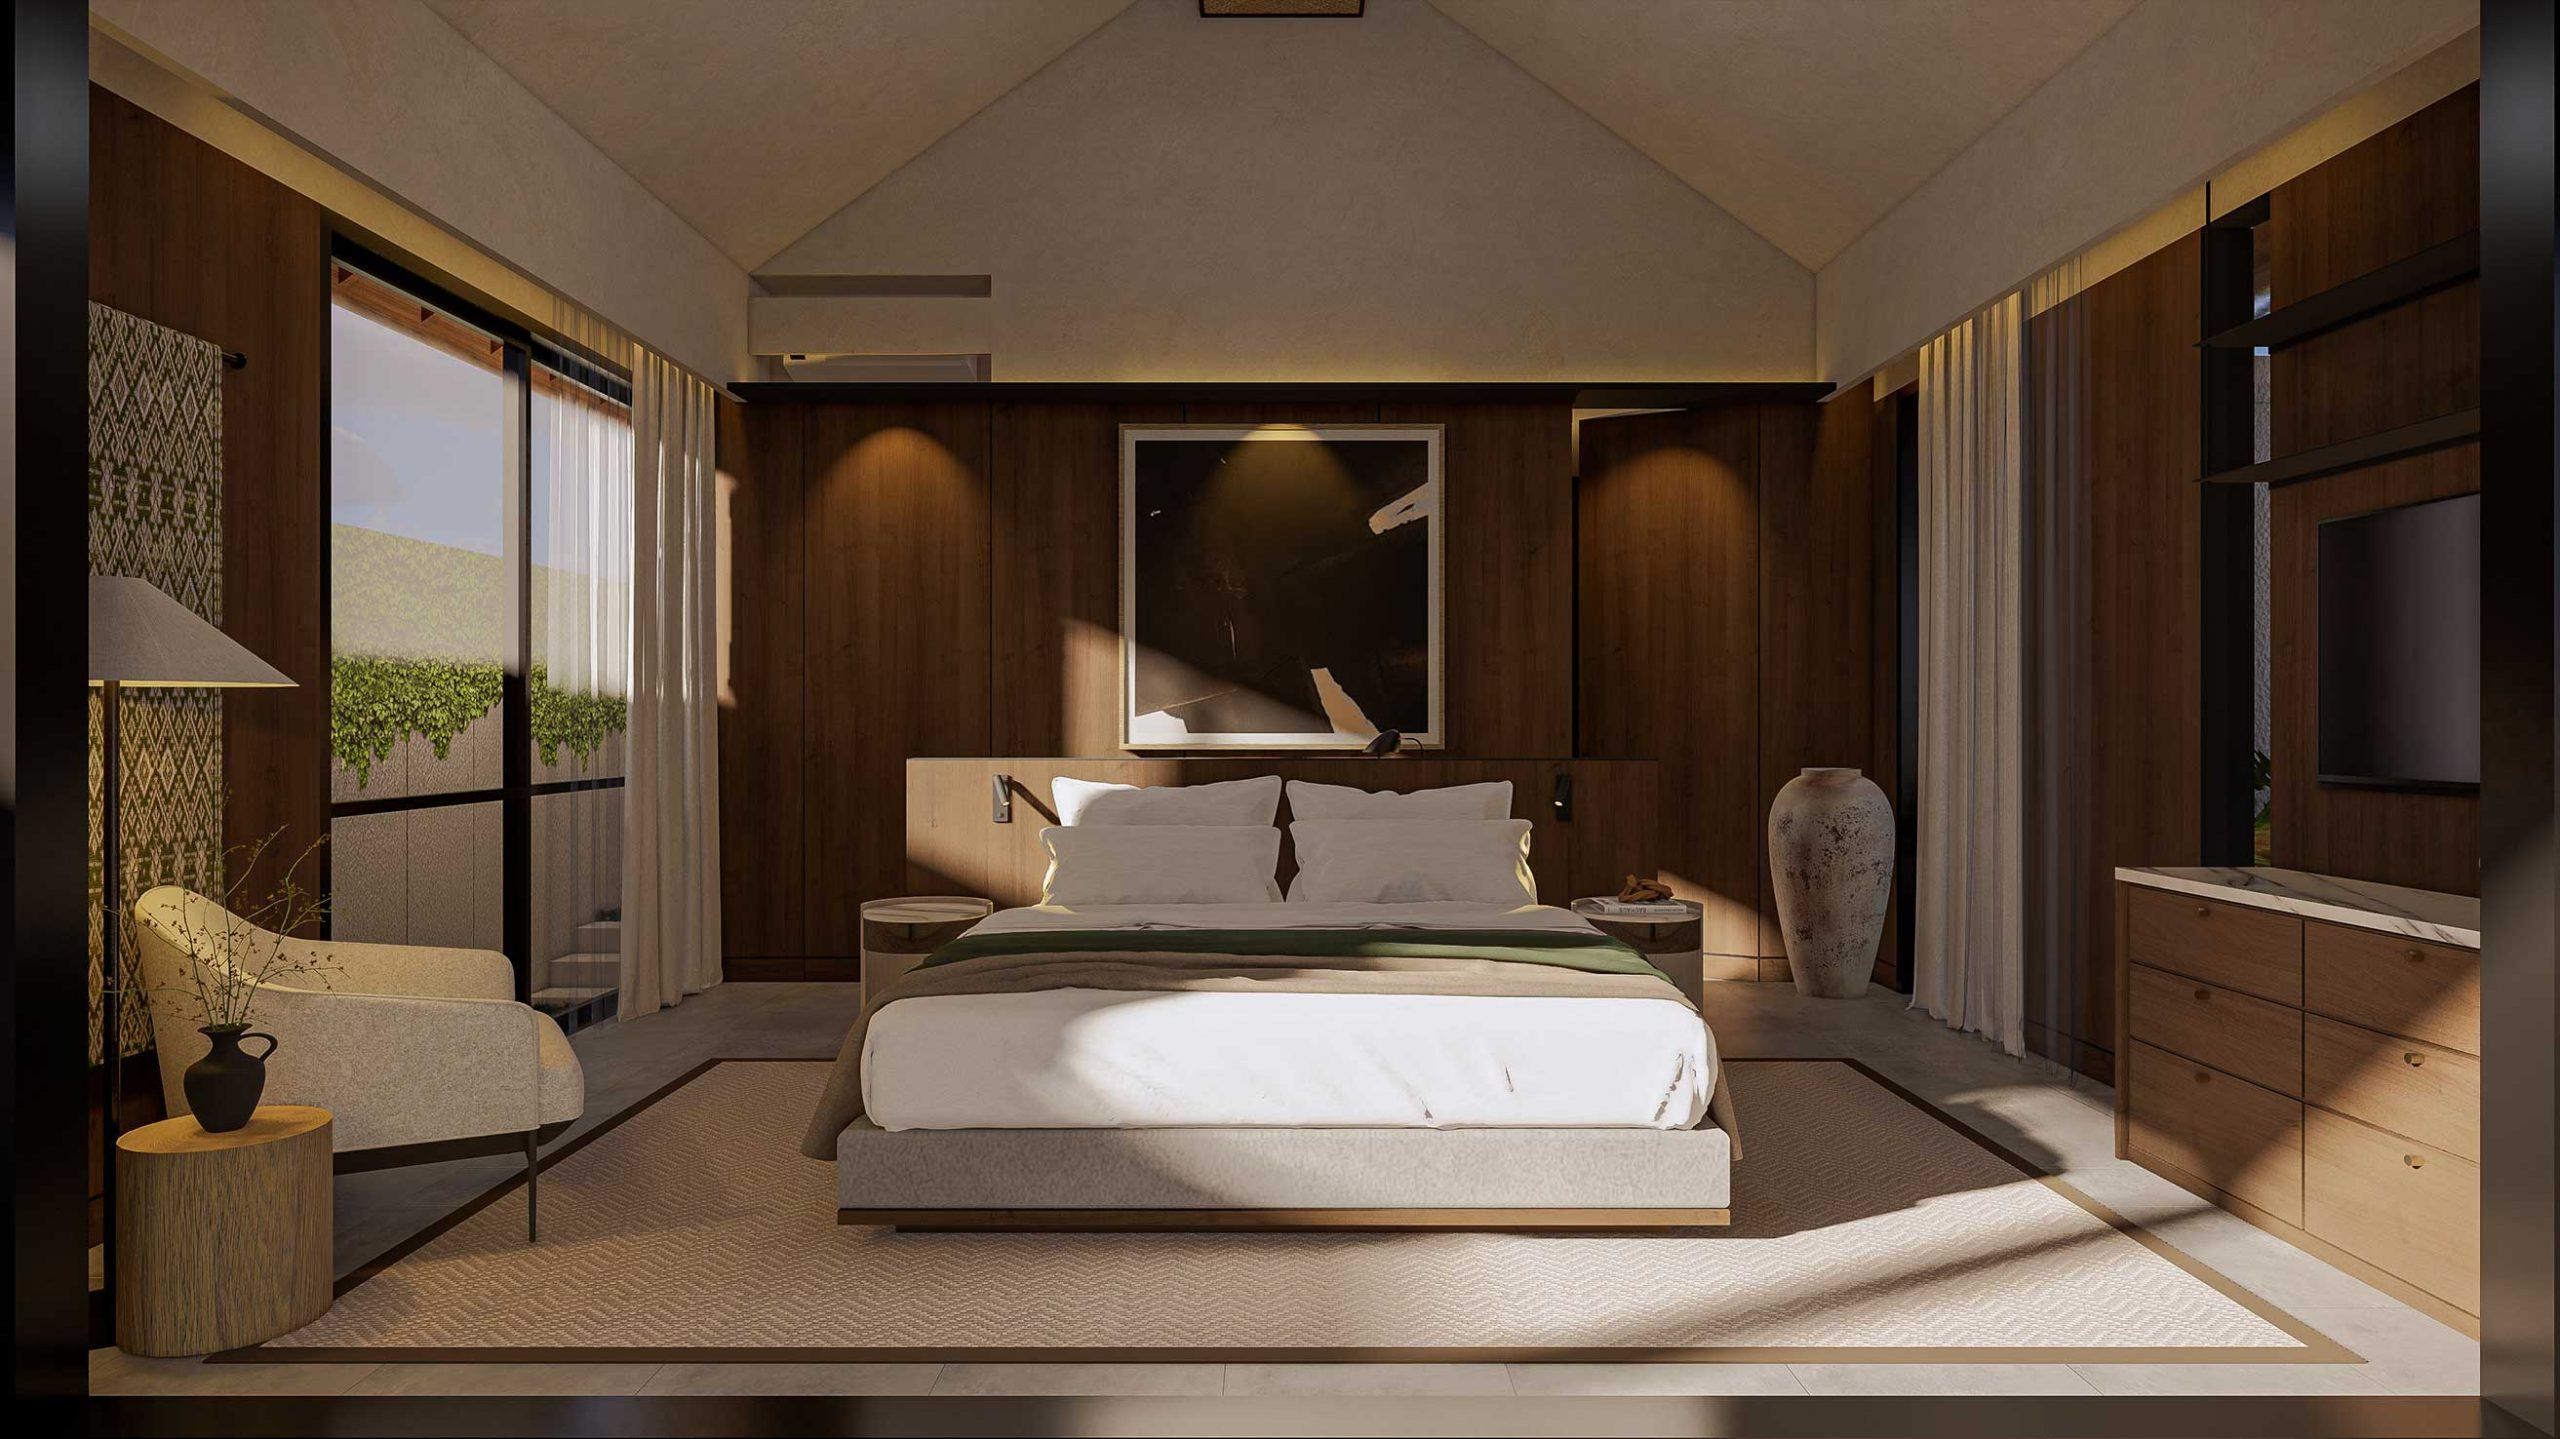 https://natadesa.com/wp-content/uploads/2021/08/Master-Bedroom-scaled.jpg